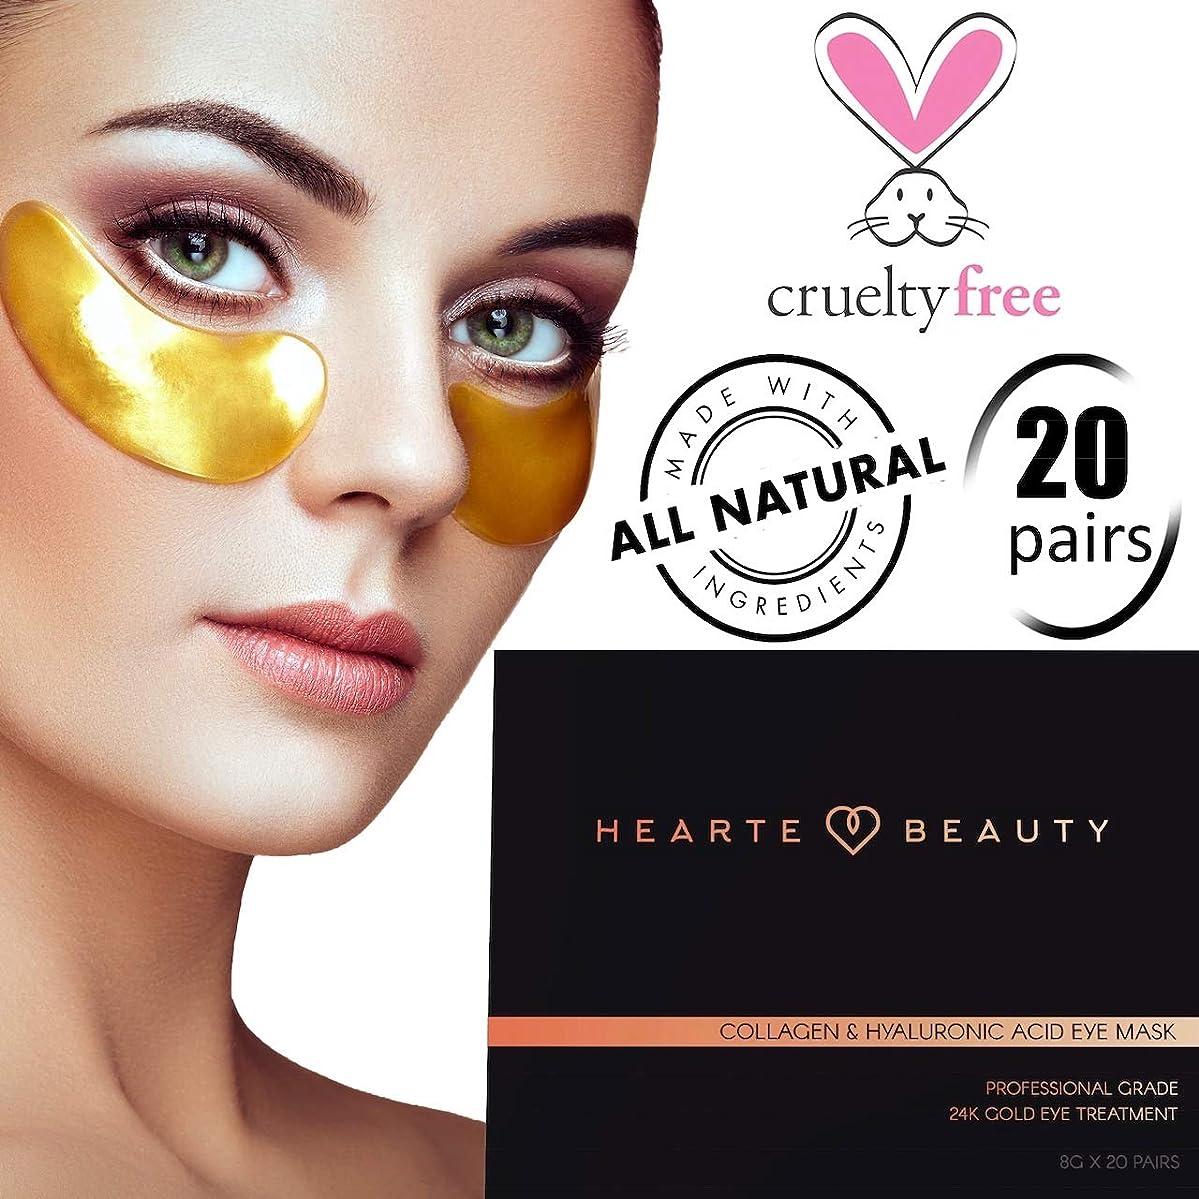 24K Gold Under Eye Patches | Brightening Under Eye Pads | Collagen Eye Masks | Under Eye Bags Treatment For Dark Circles | Cruelty Free Vegan & Professional Grade | 20 Pairs by Hearte Beauty